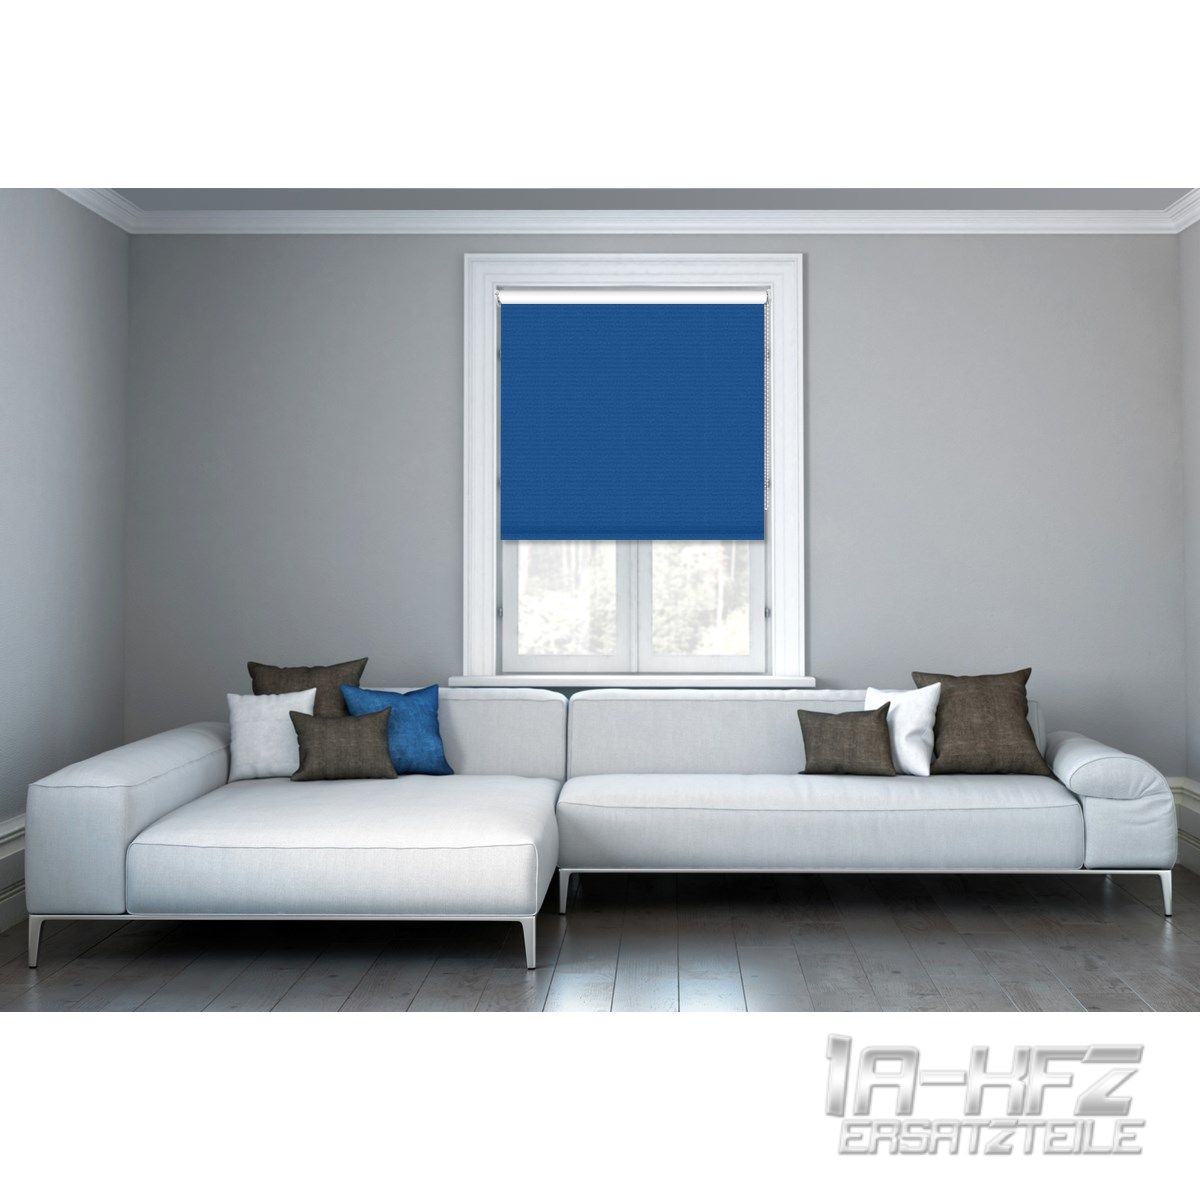 klemmfix verdunkelungsrollo fenster verdunklungsrollo klemm rollo ohne bohren ebay. Black Bedroom Furniture Sets. Home Design Ideas